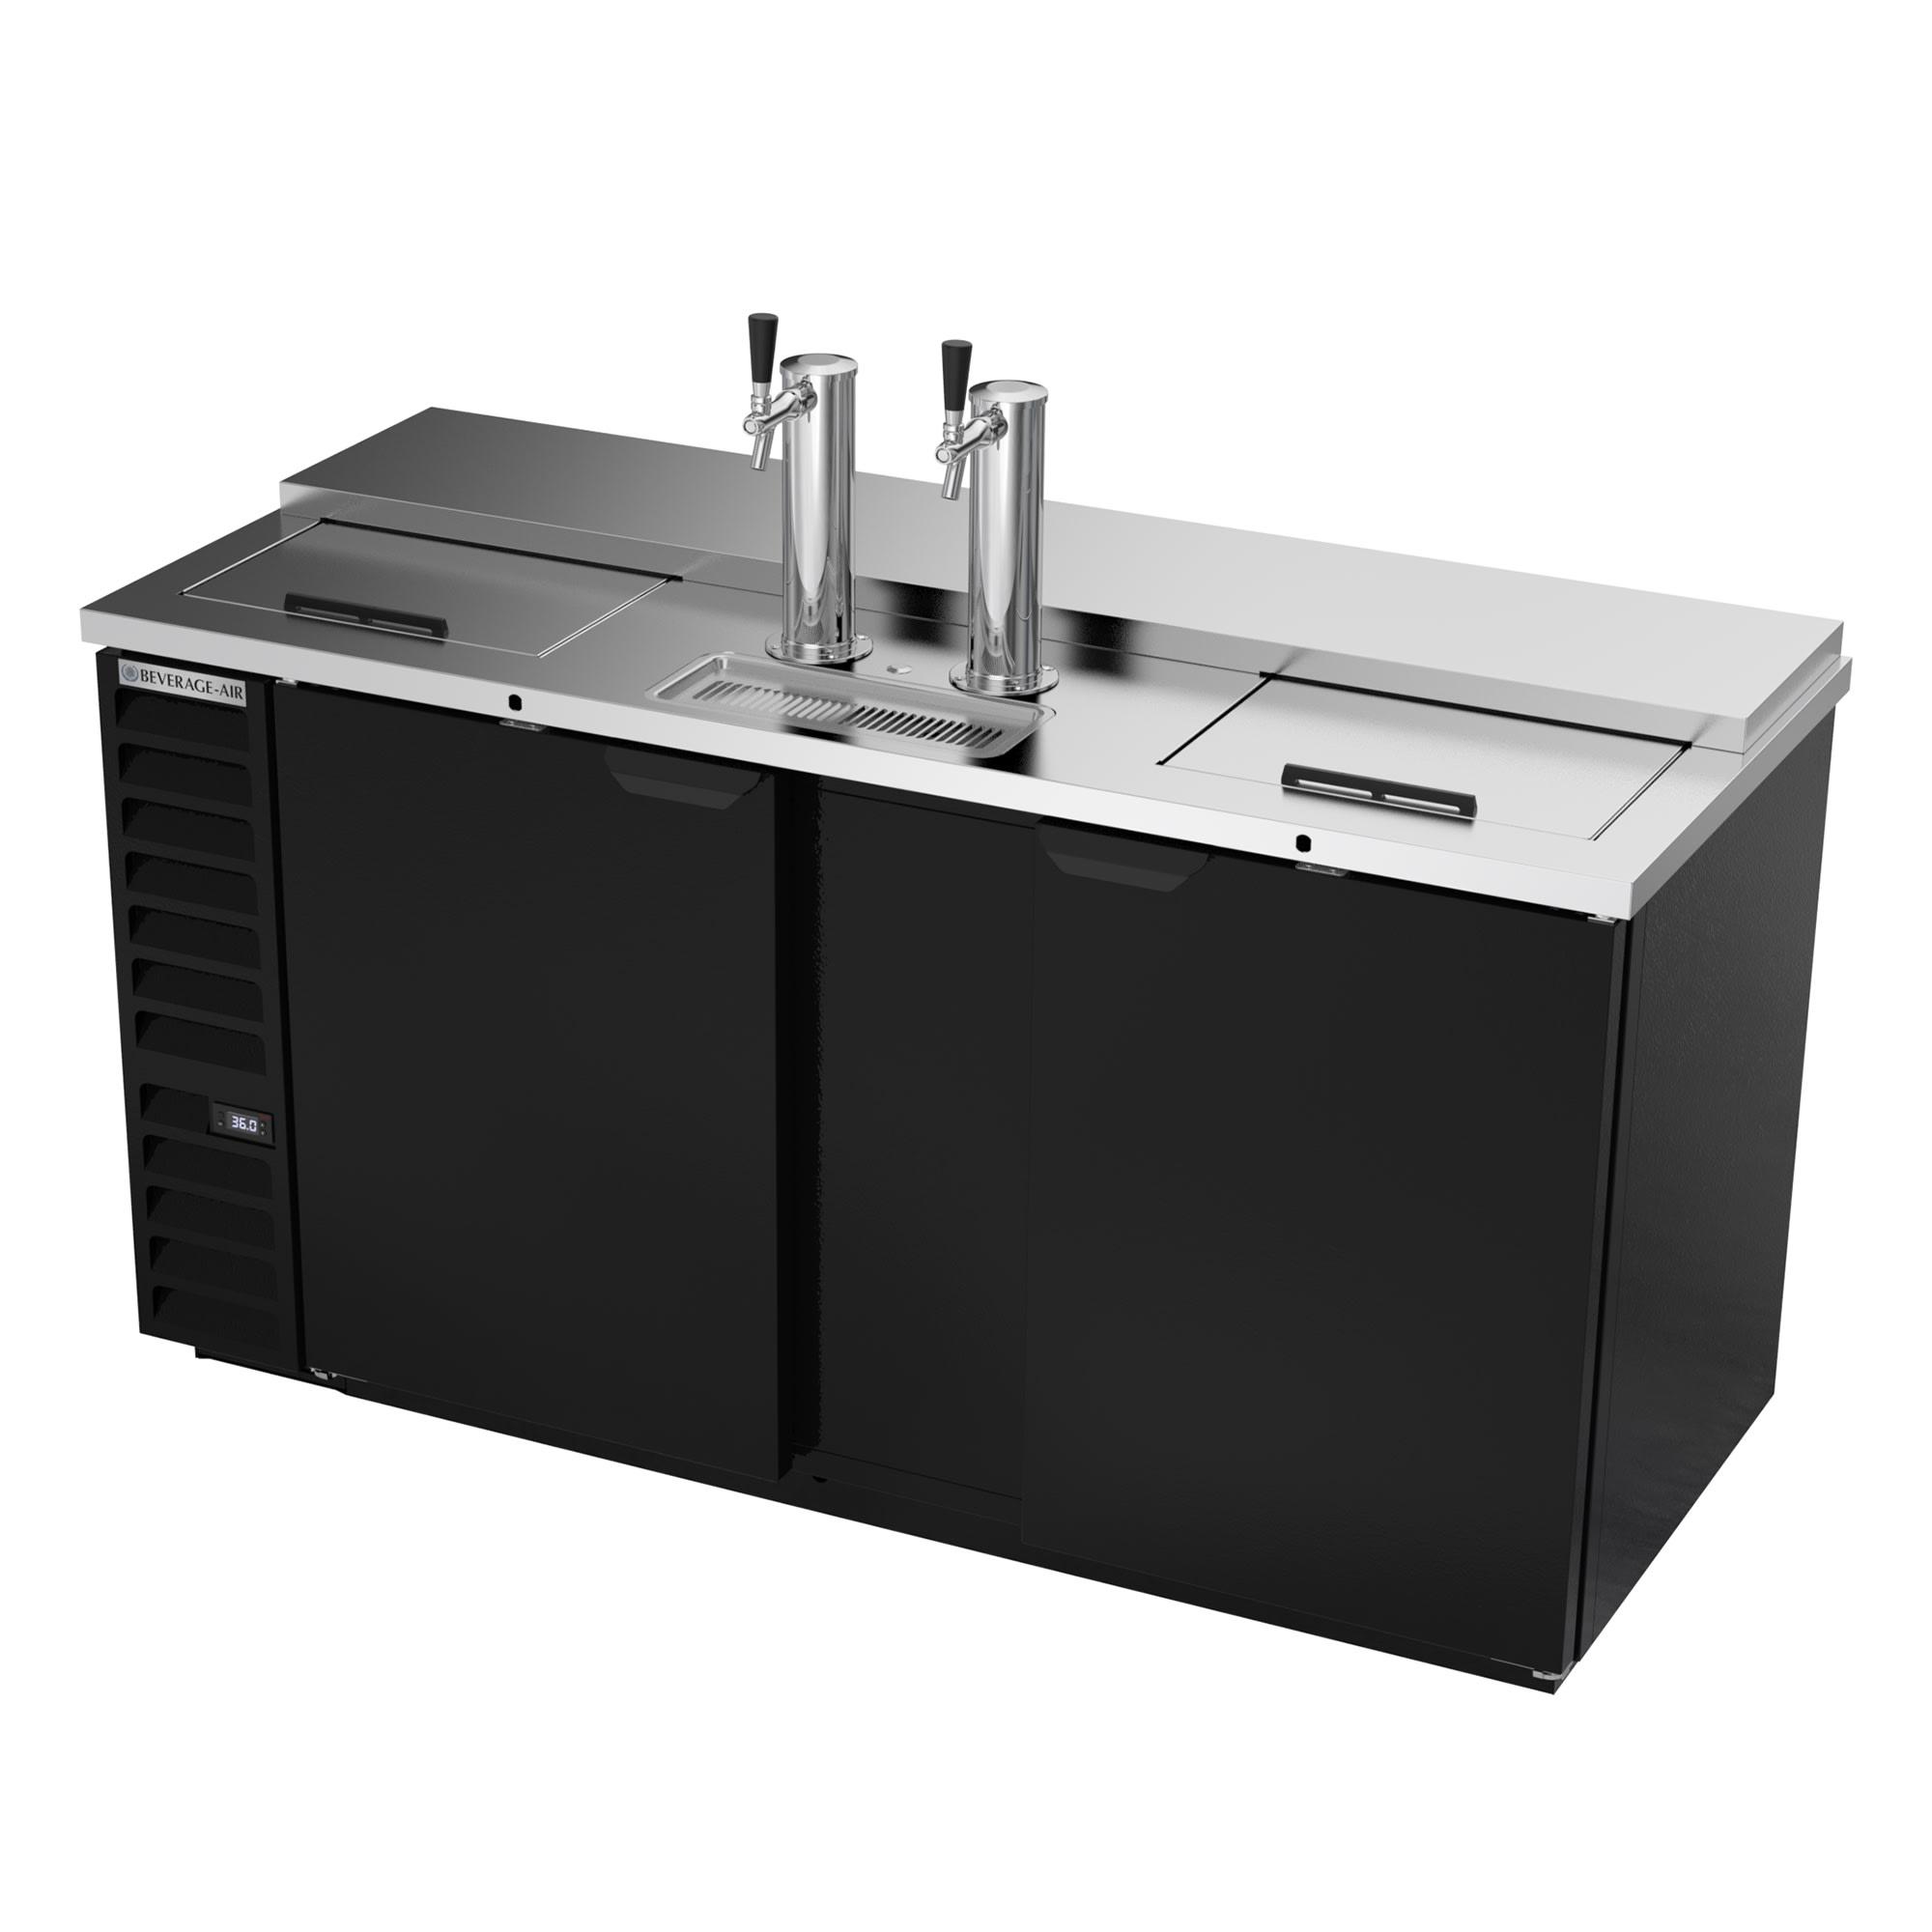 "Beverage Air DD68HC-1-C-B 69"" Draft Beer System w/ (3) Keg Capacity - (2) Column, Black, 115v"